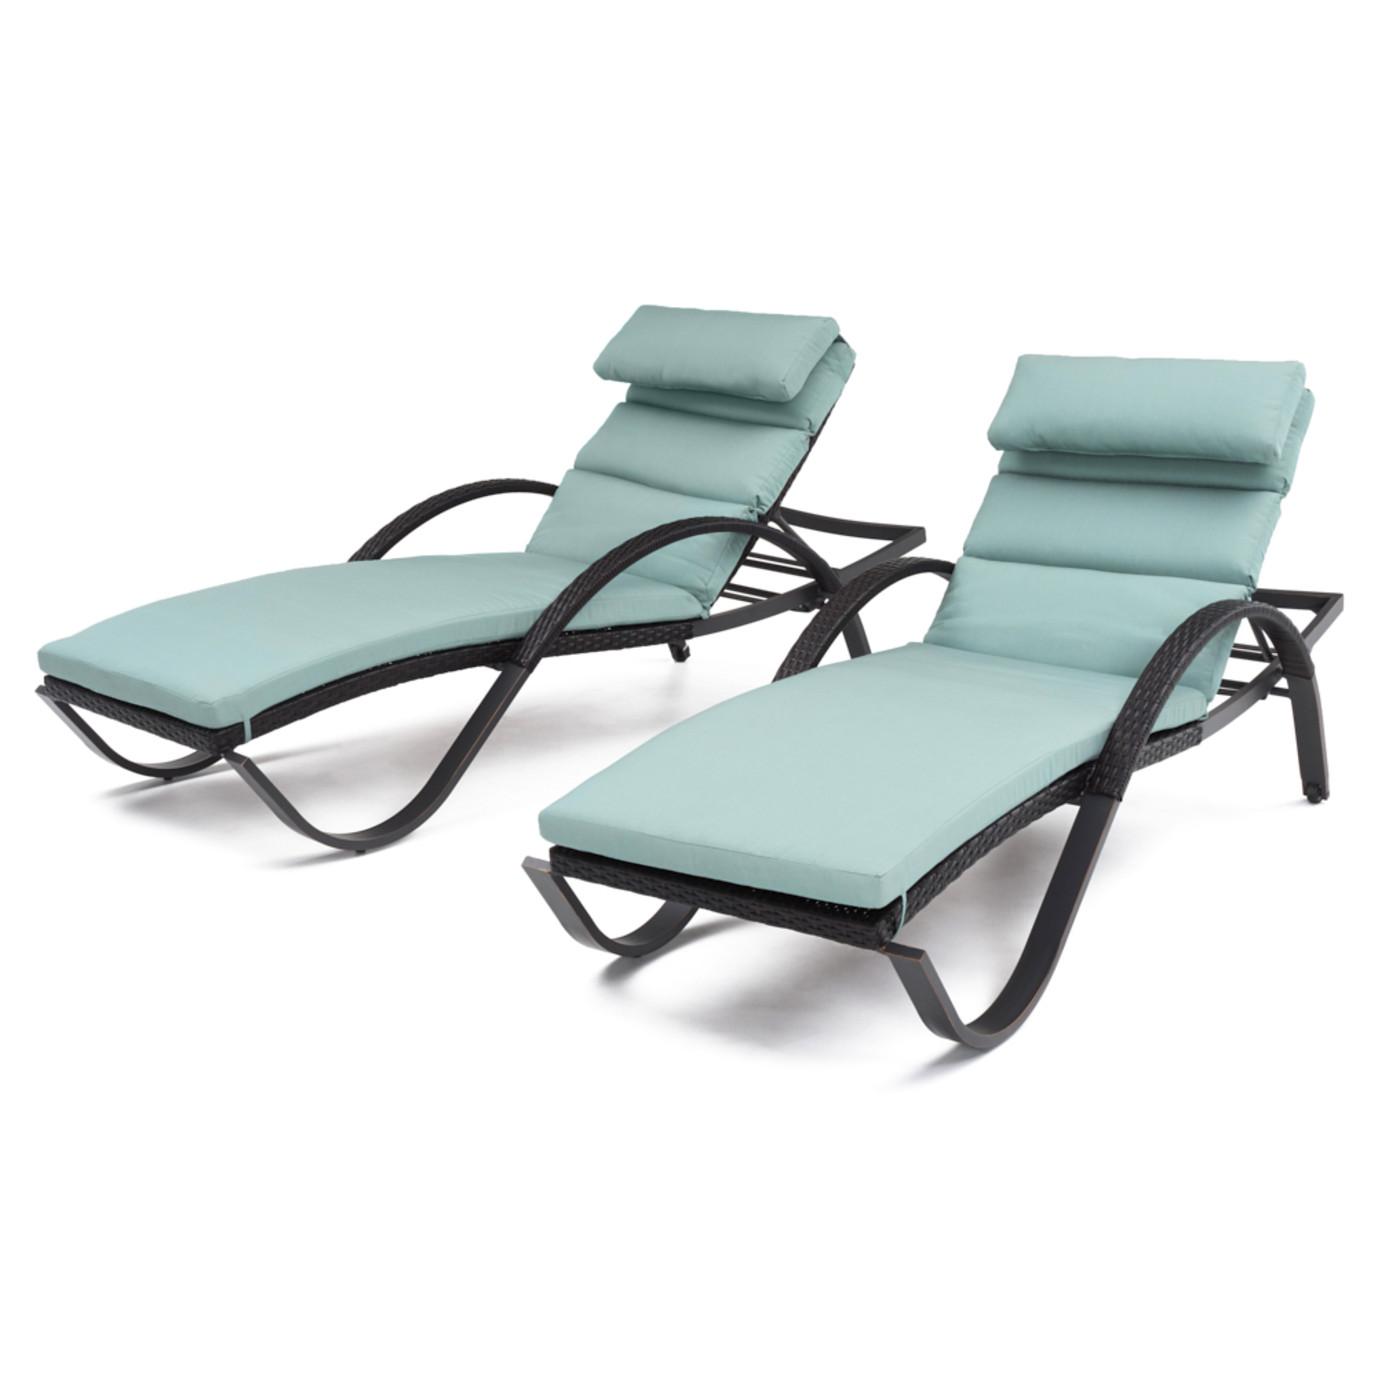 Deco™ 20pc Outdoor Estate Set - Spa Blue